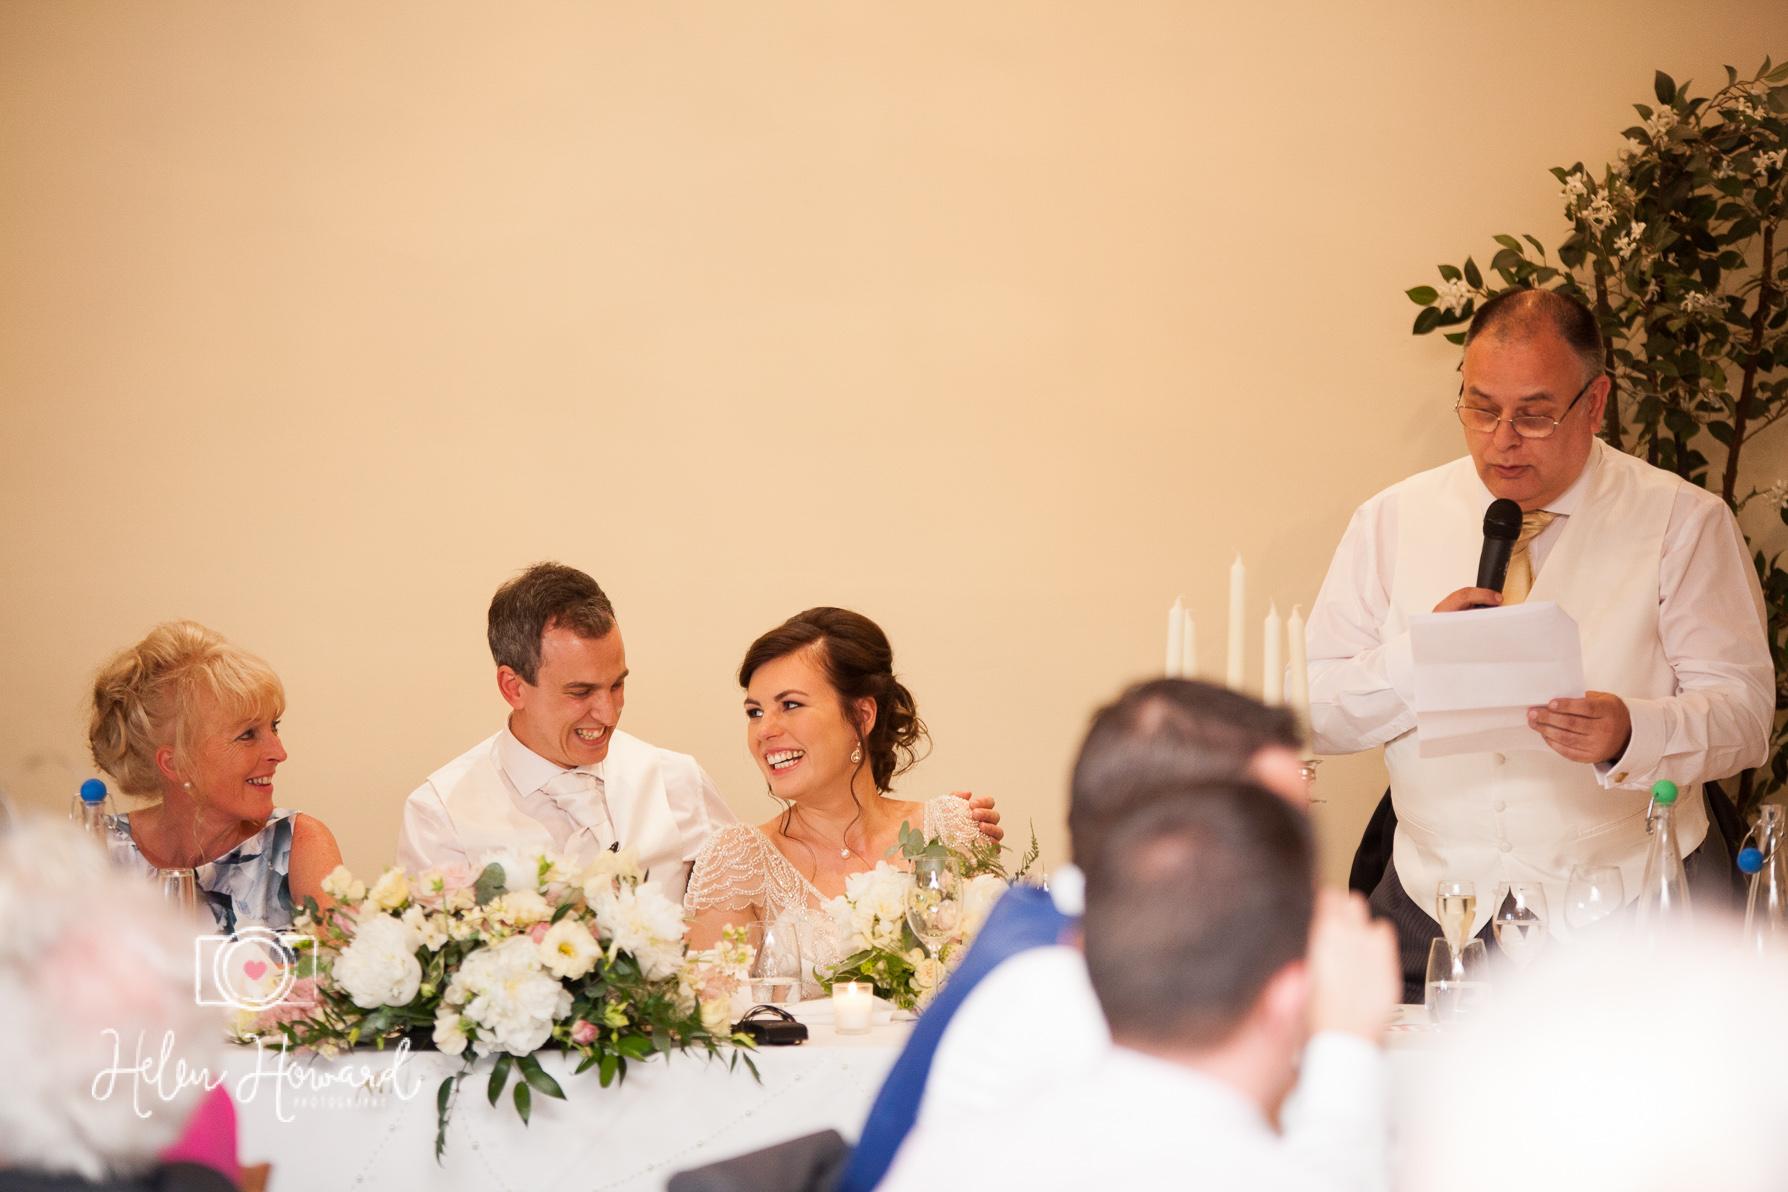 Helen Howard Photography Packington Moor Wedding-93.jpg